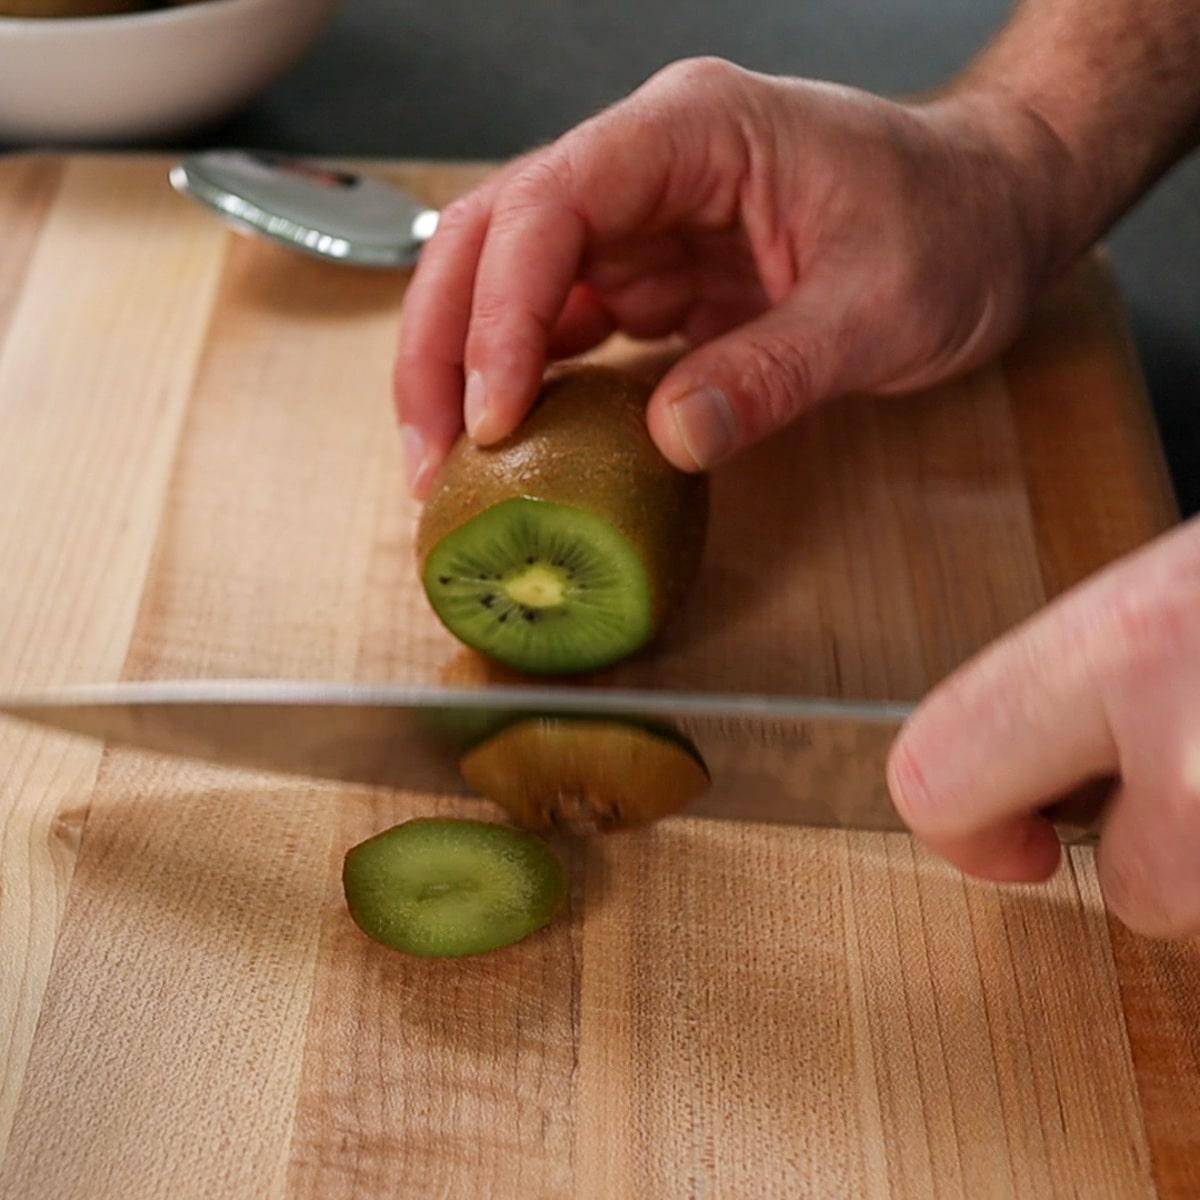 cutting ends off a kiwi fruit